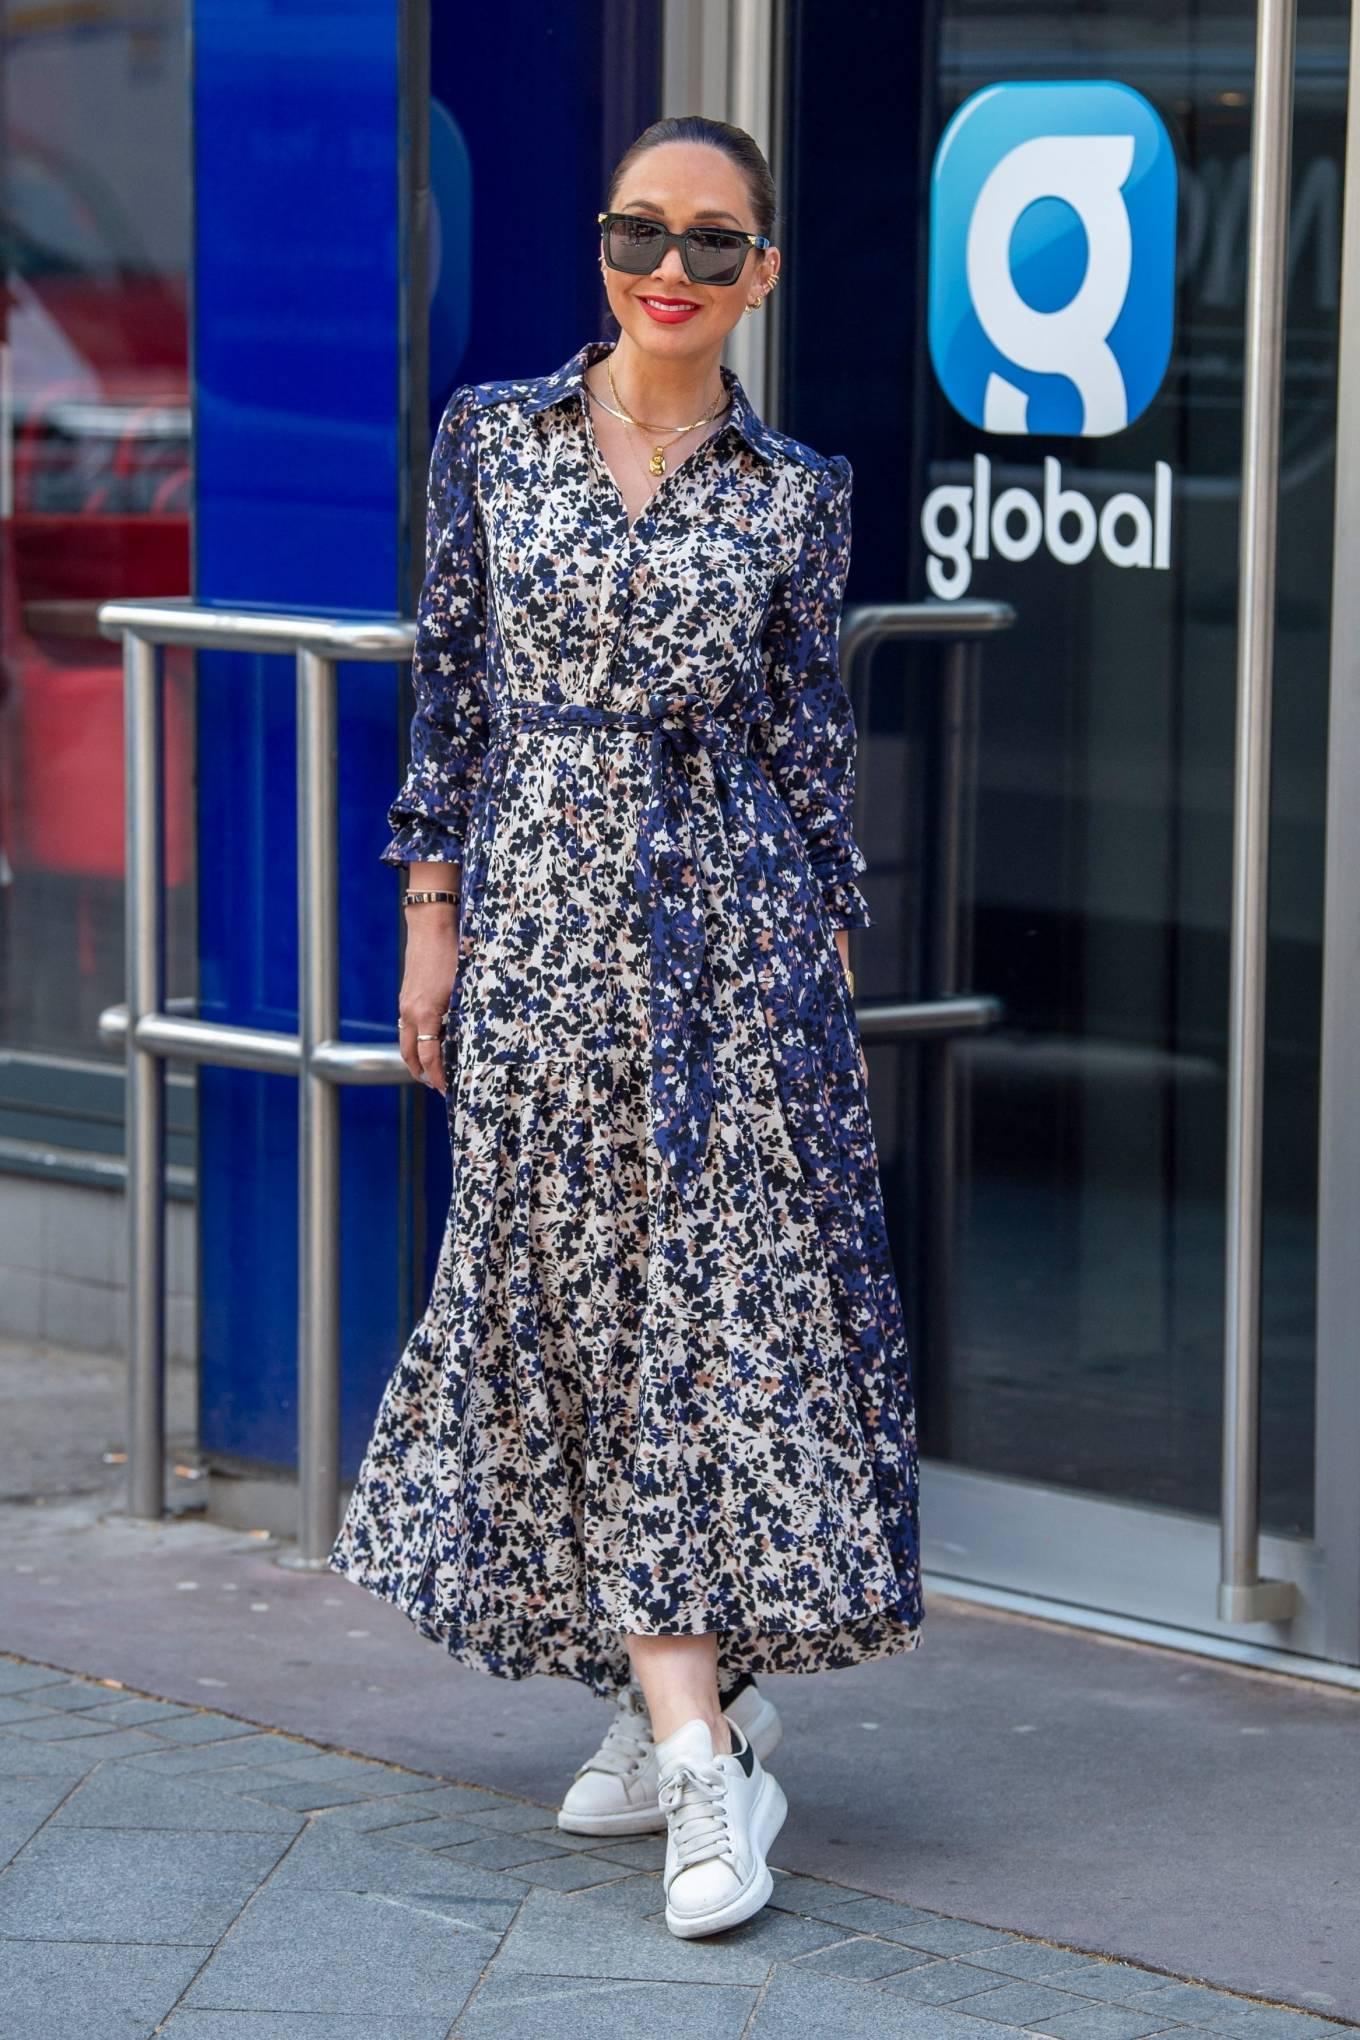 Myleene Klass 2021 : Myleene Klass – In a long summer dress arriving at the Global studios -09